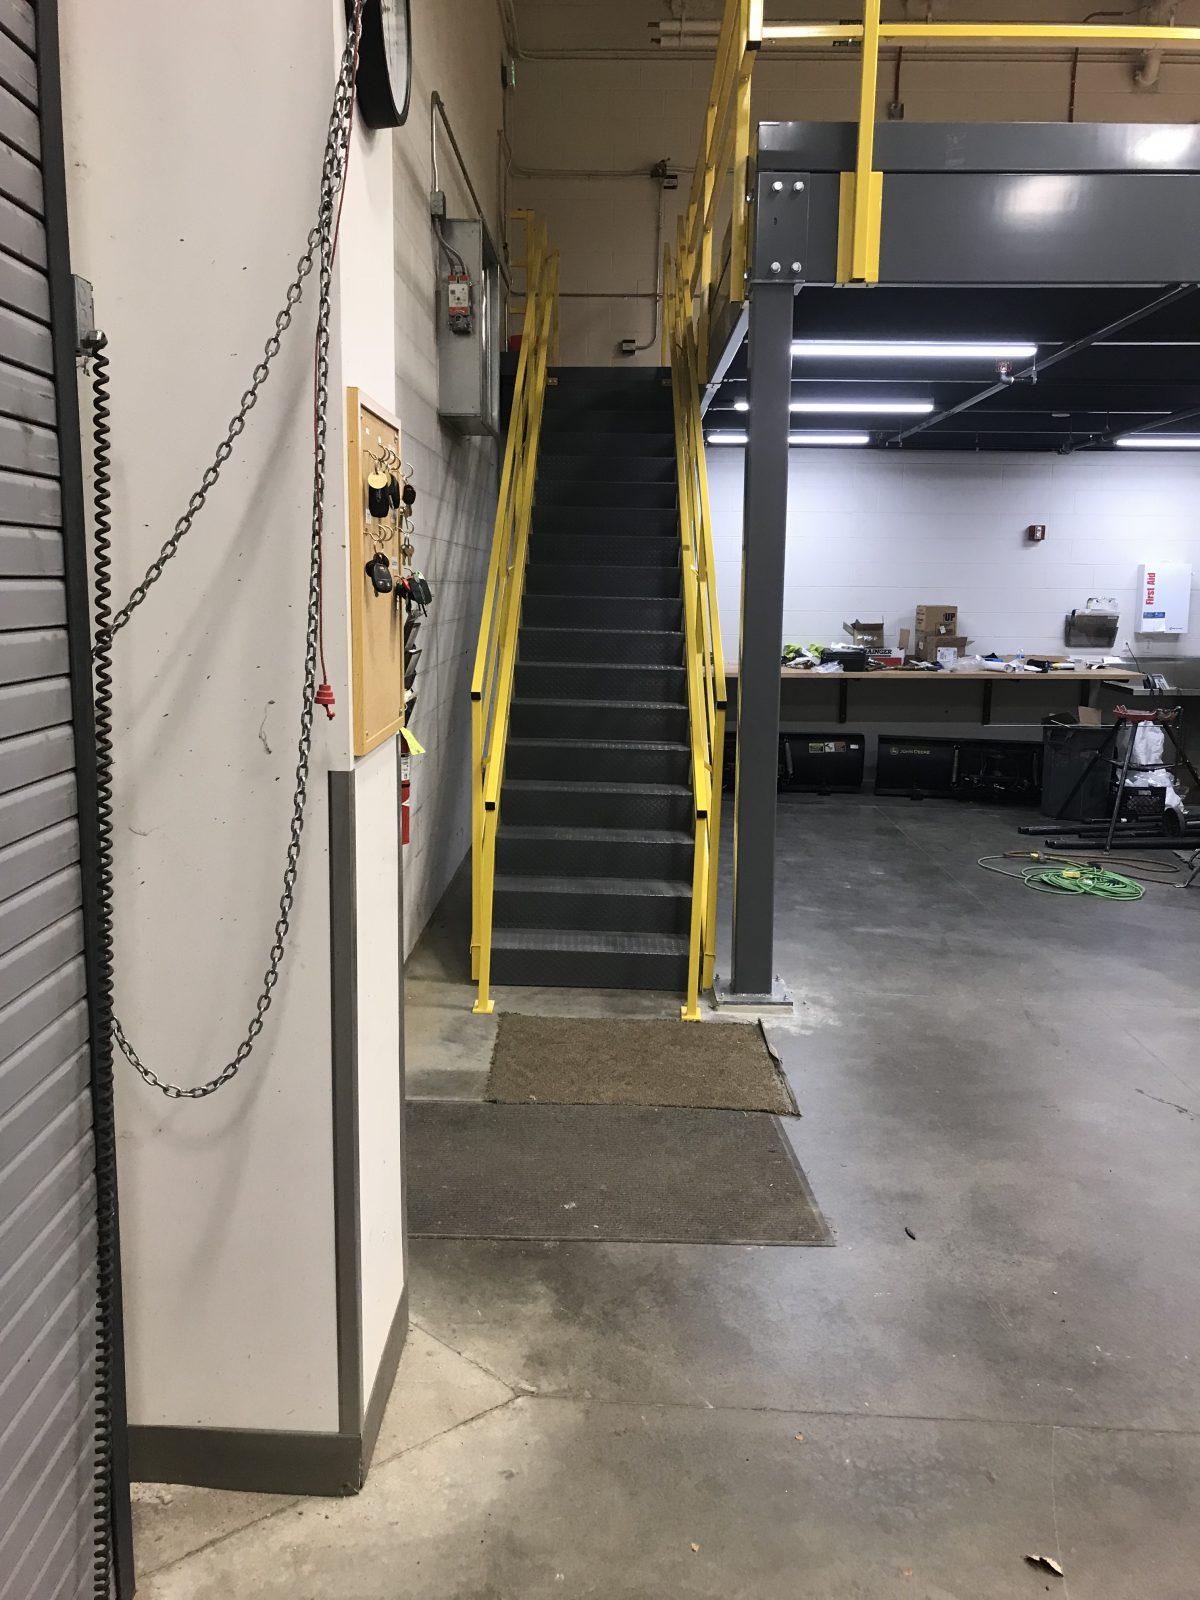 Western Storage, Cubic Design Mezzanine Systems, Mezzanine Systems, Western Storage and handling, Mezzanine Systems